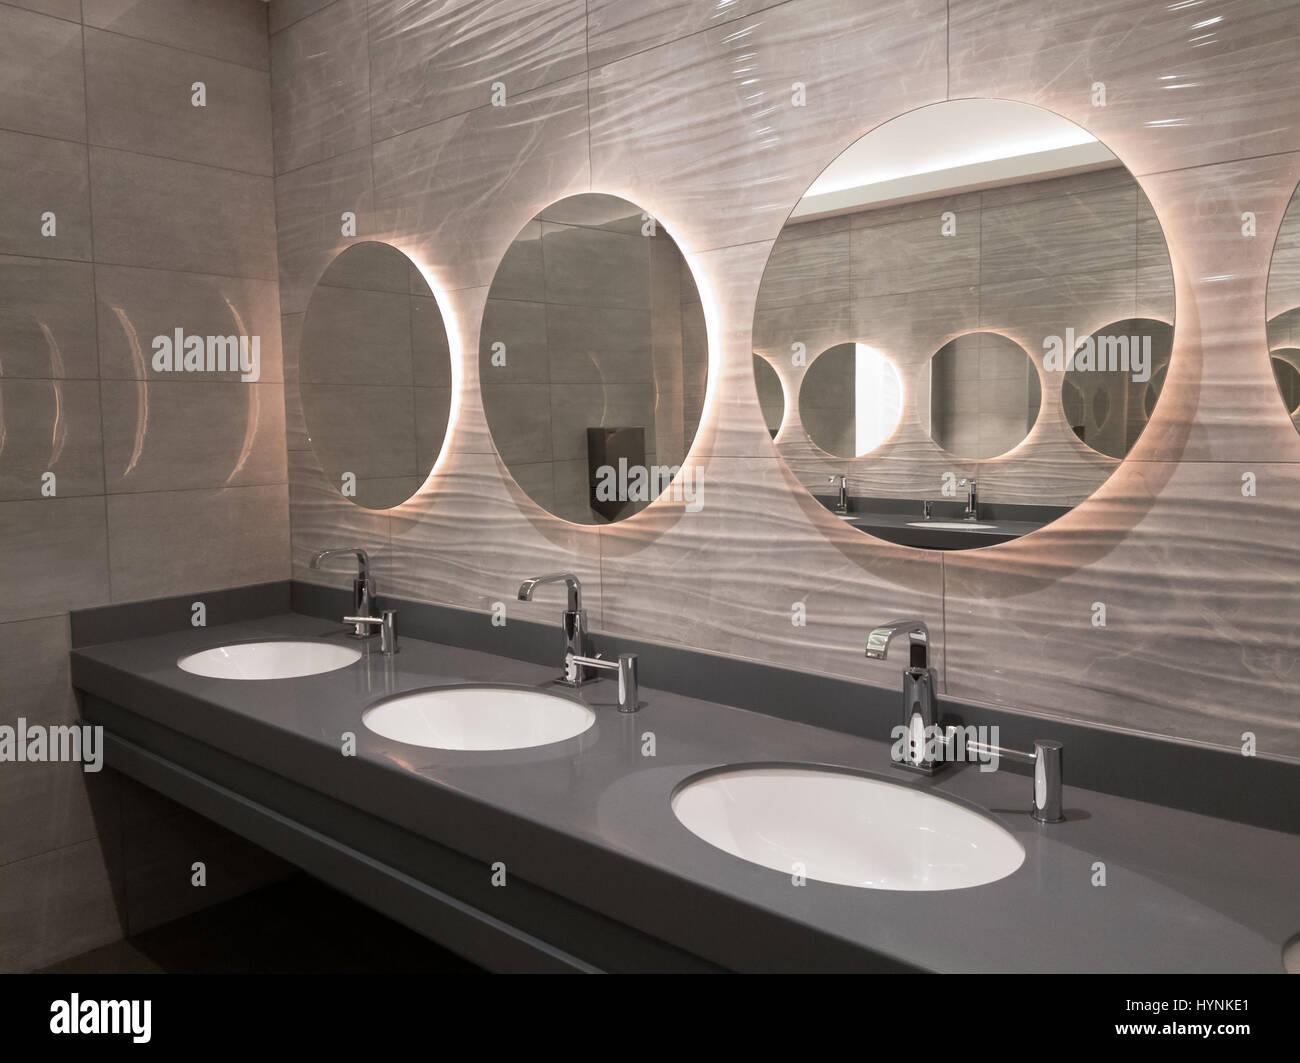 Modern public washroom interior Stock Photo: 137544569